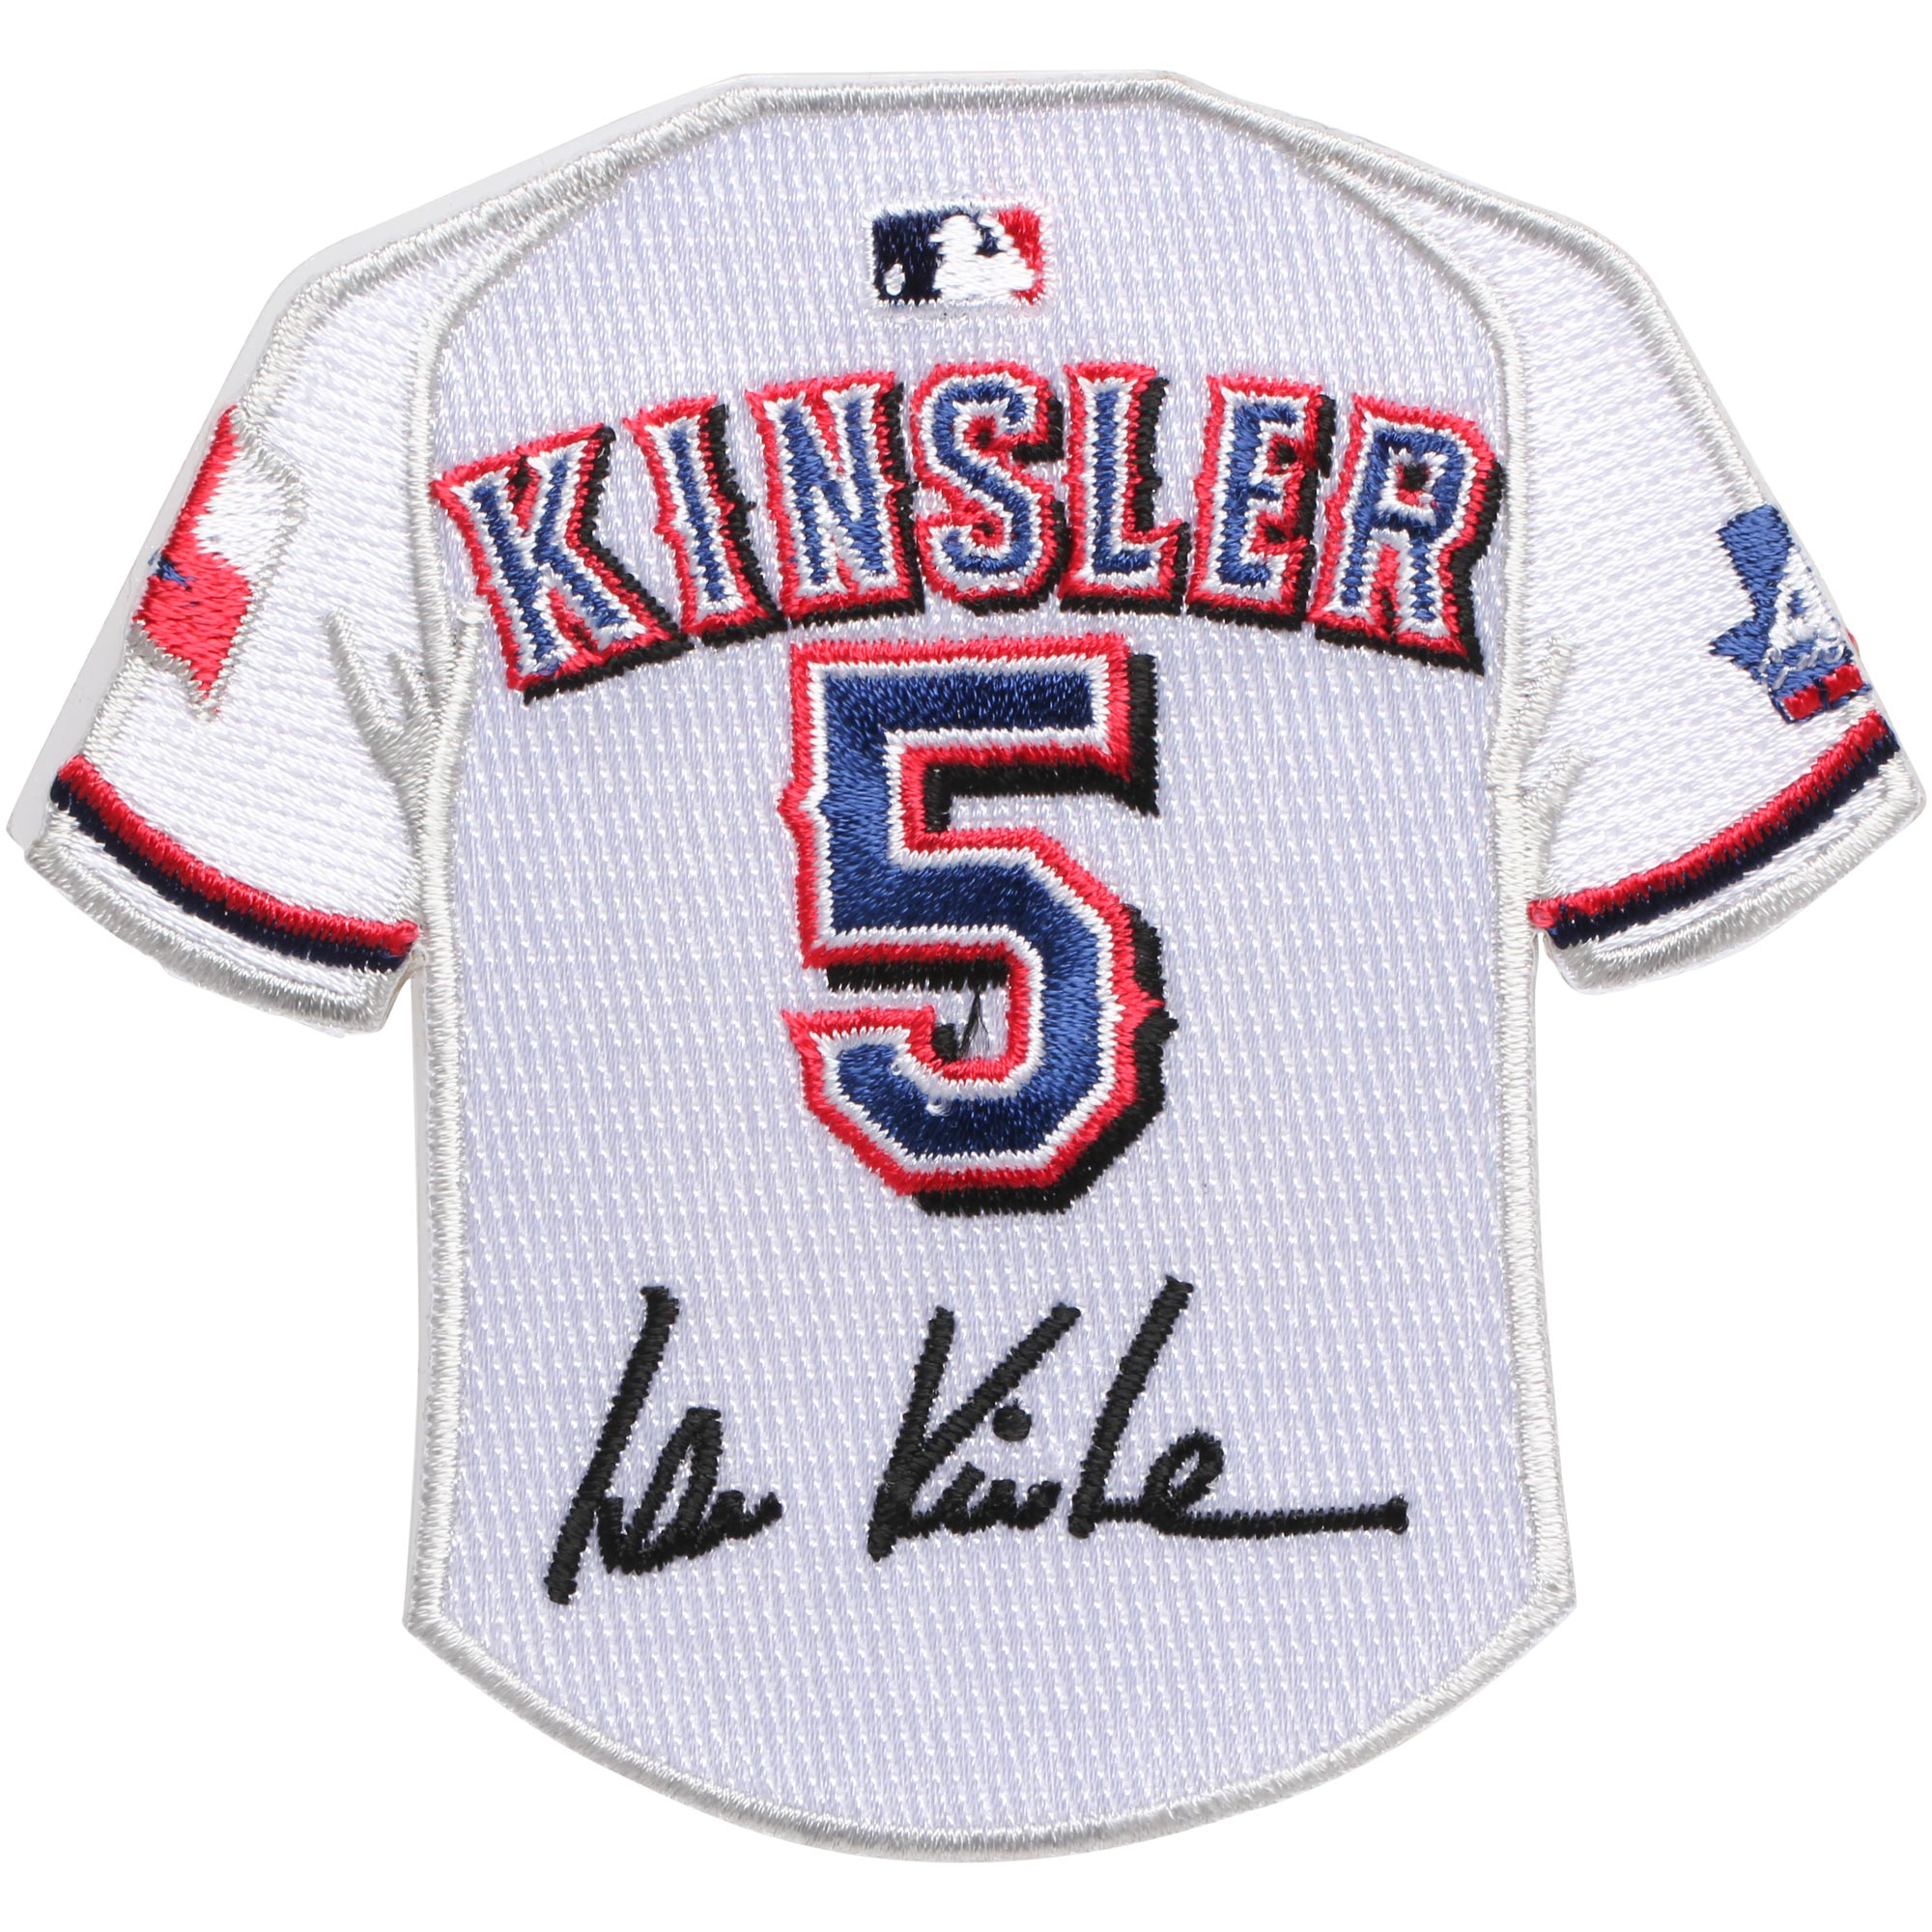 Ian Kinsler Texas Rangers Mini Jersey Patch - No Size